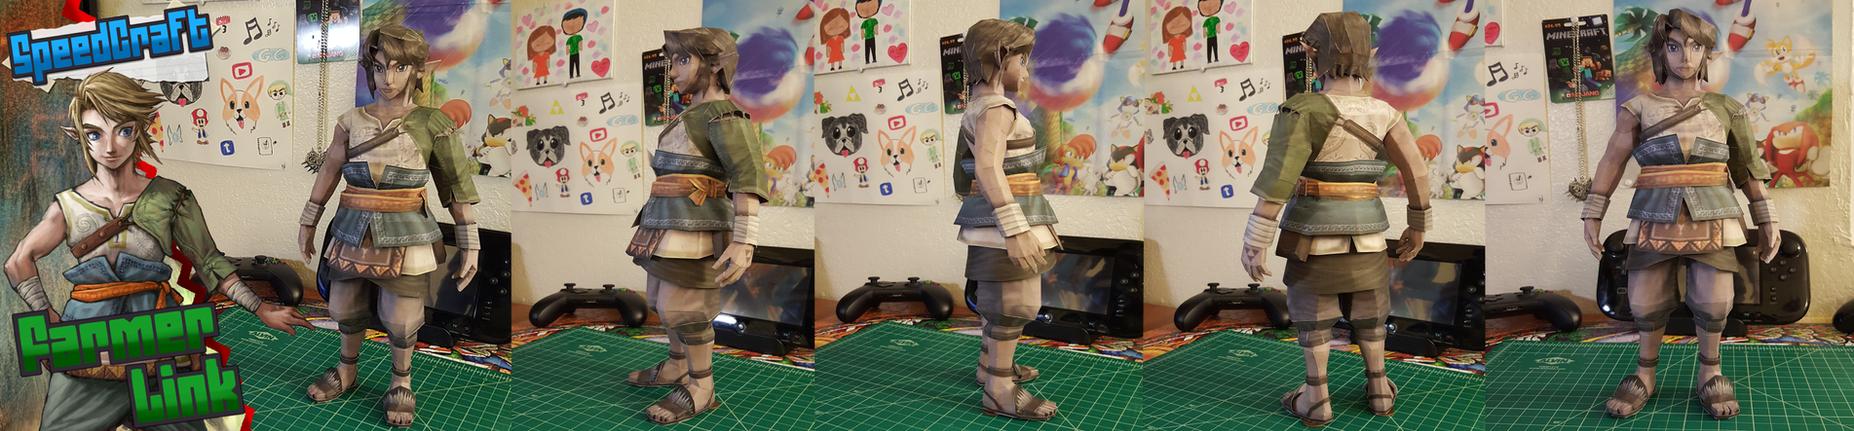 The Legend of Zelda Papercraft ~ Farmer Link ~ by SuperRetroBro